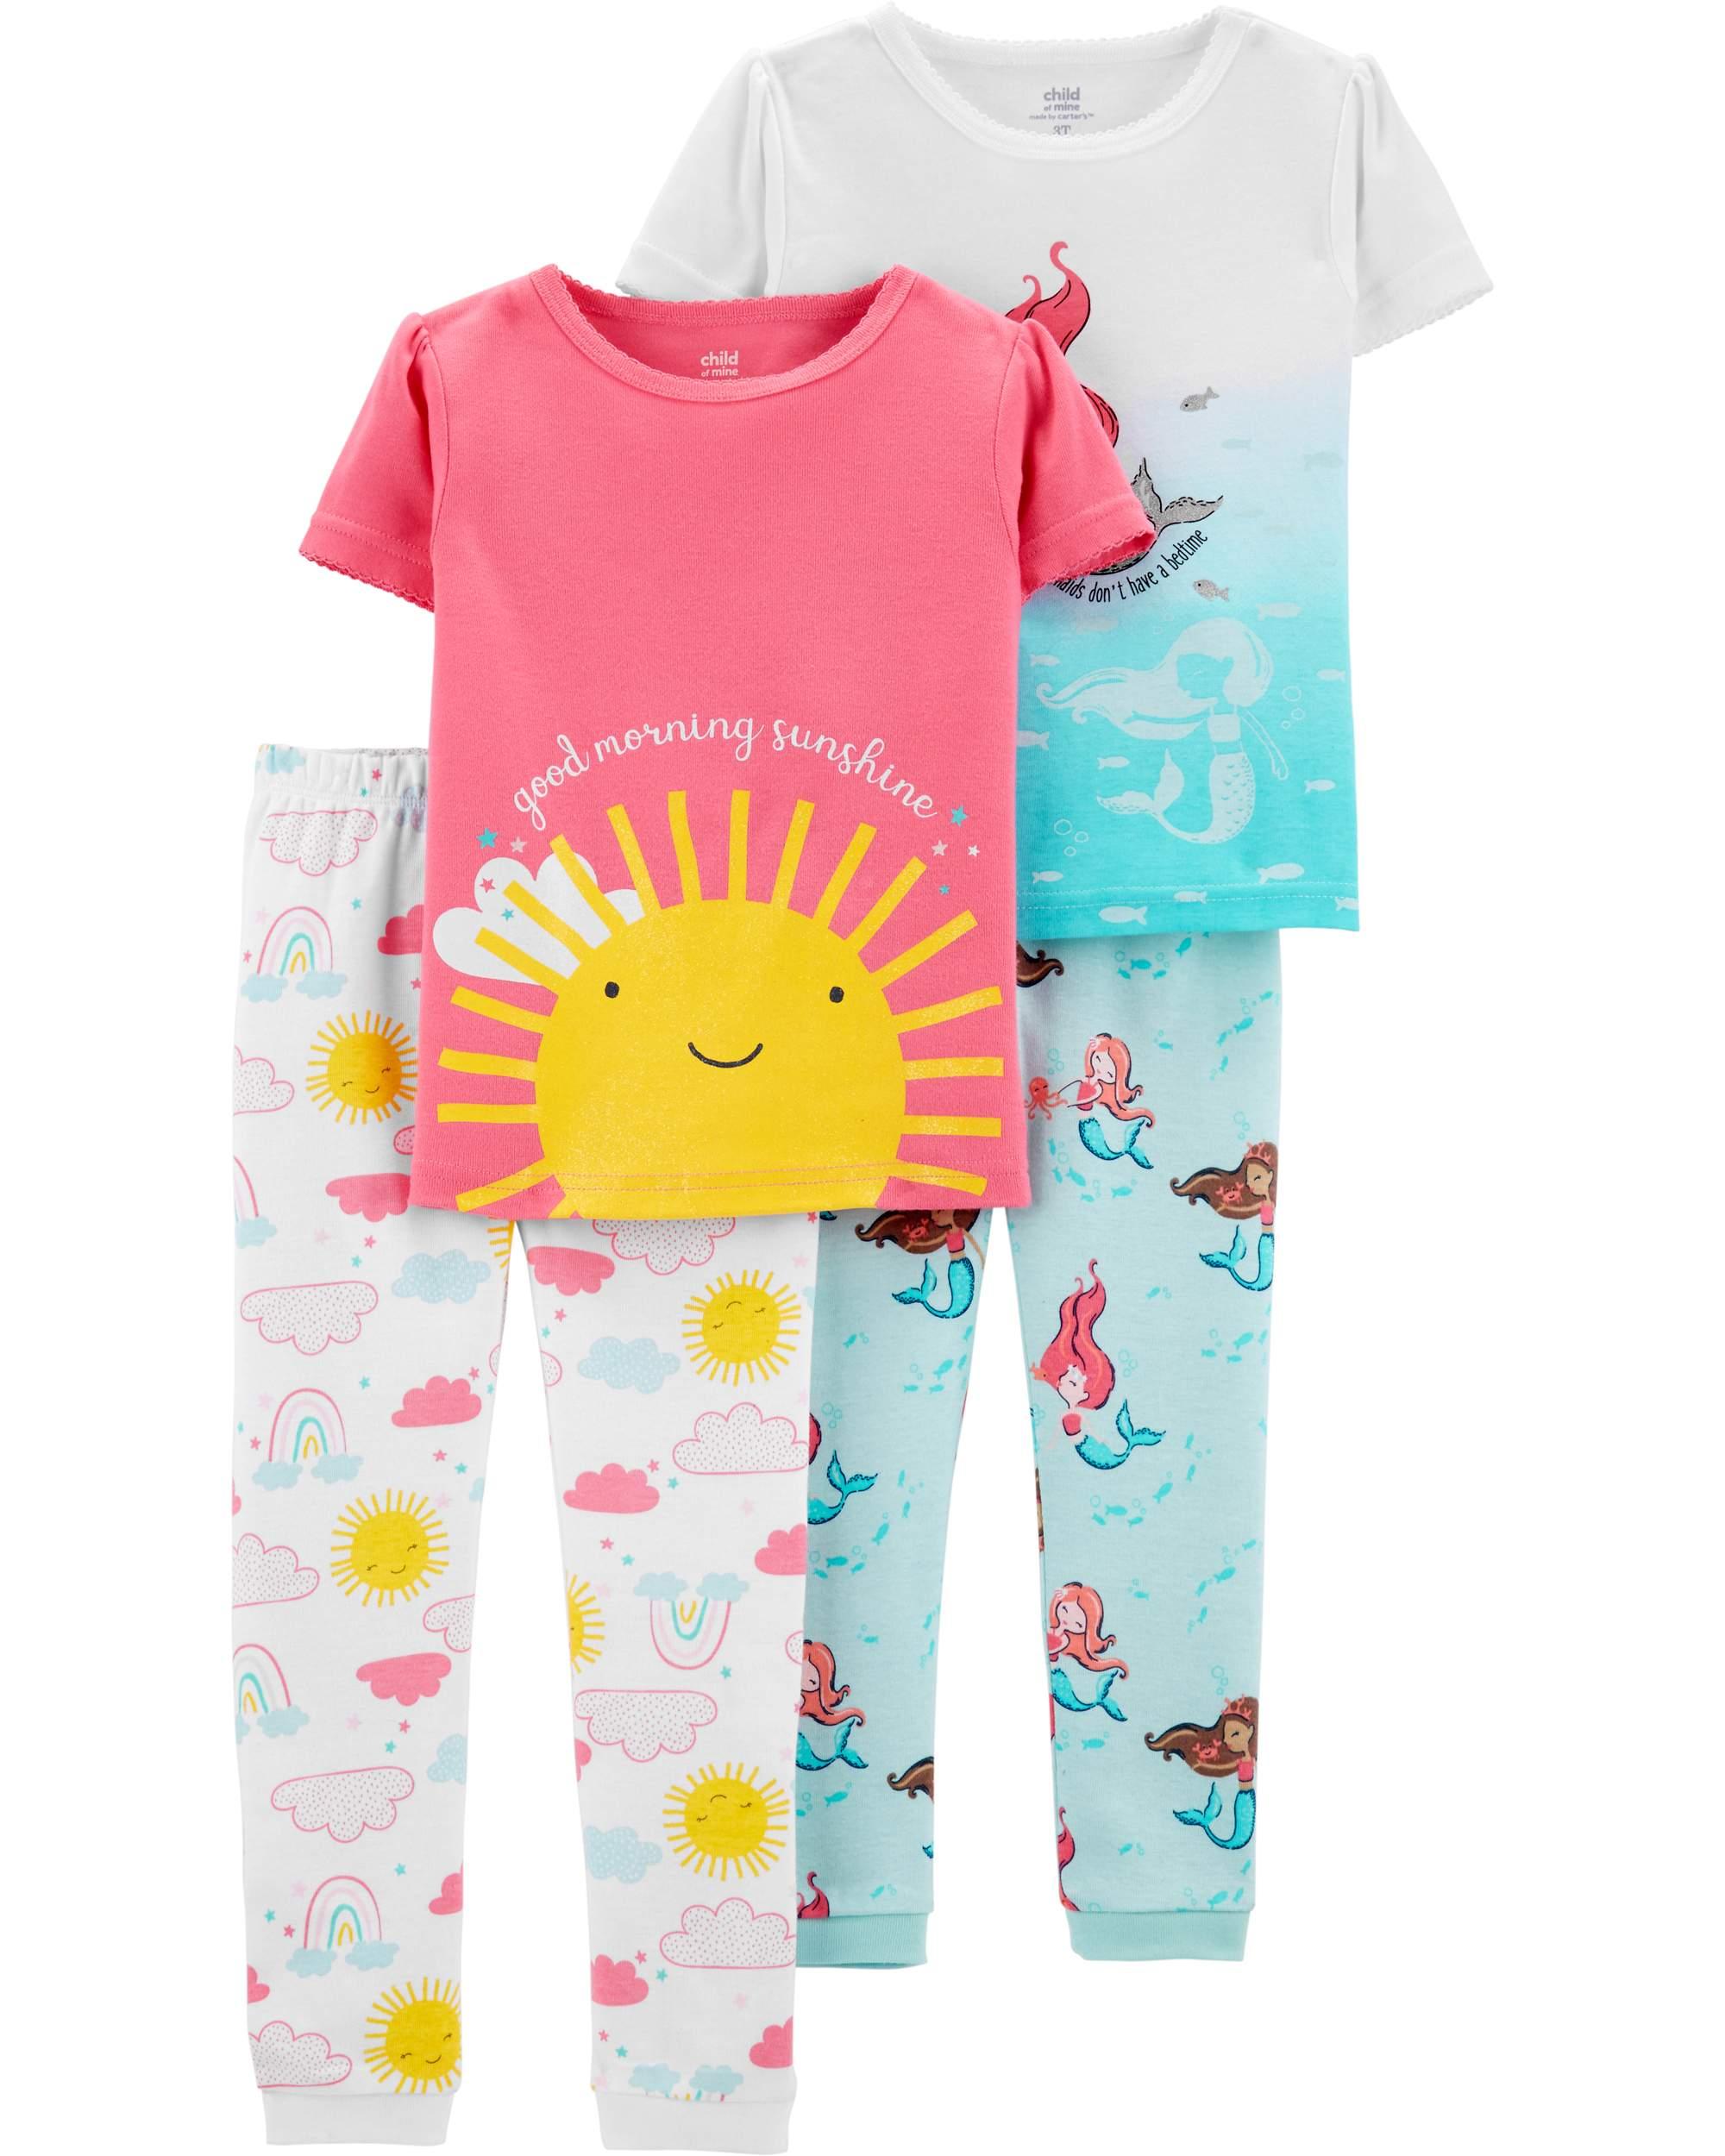 Short Sleeve T-Shirt and Pant Cotton Pajama Bundle, 2 sets (Toddler Girls)